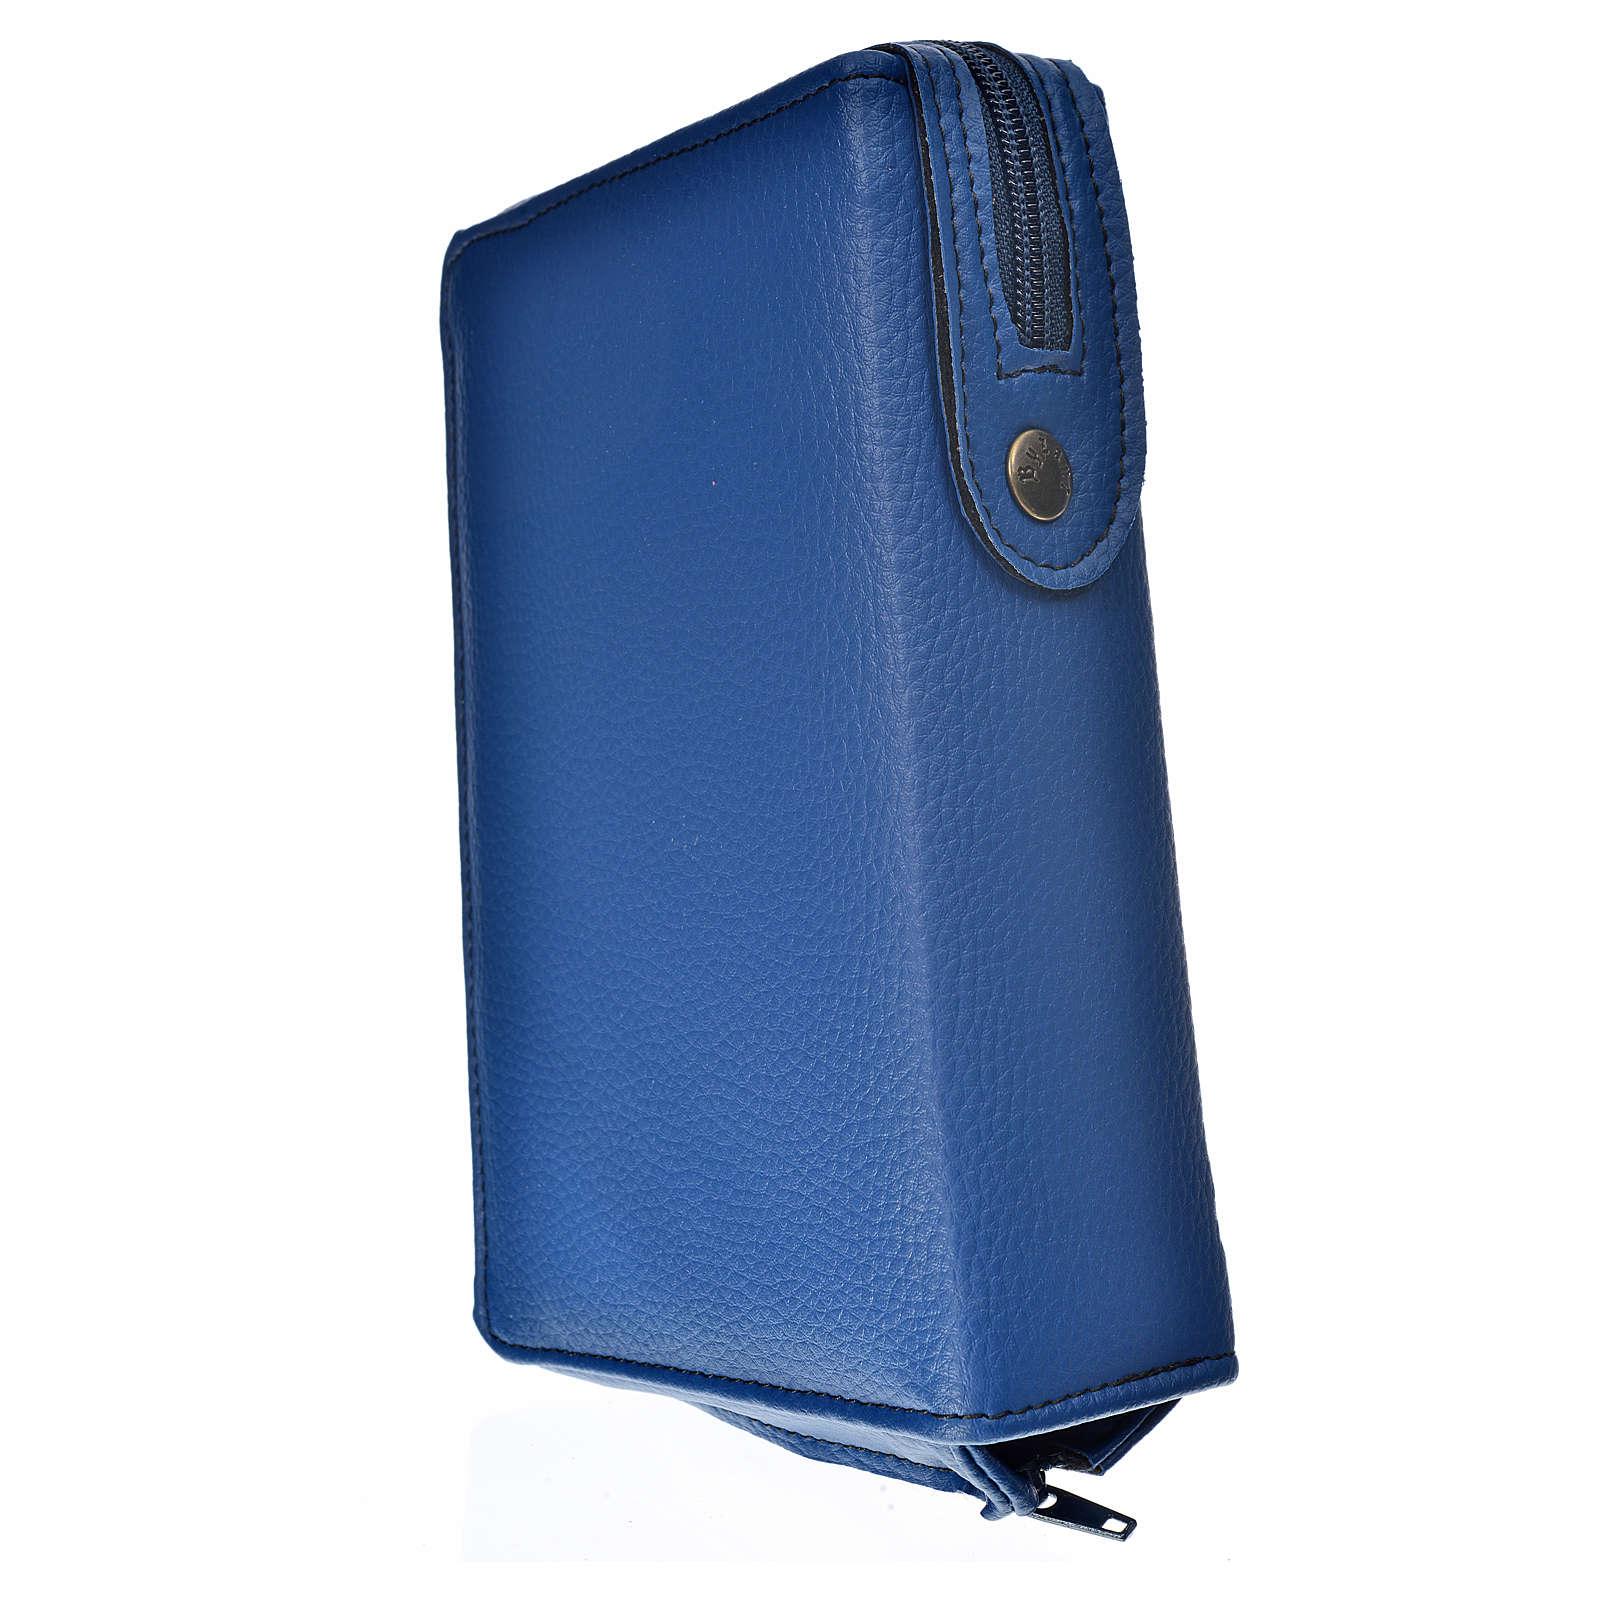 Funda Sagrada Biblia CEE ED. Pop. azul simil cuero S. Familia 4